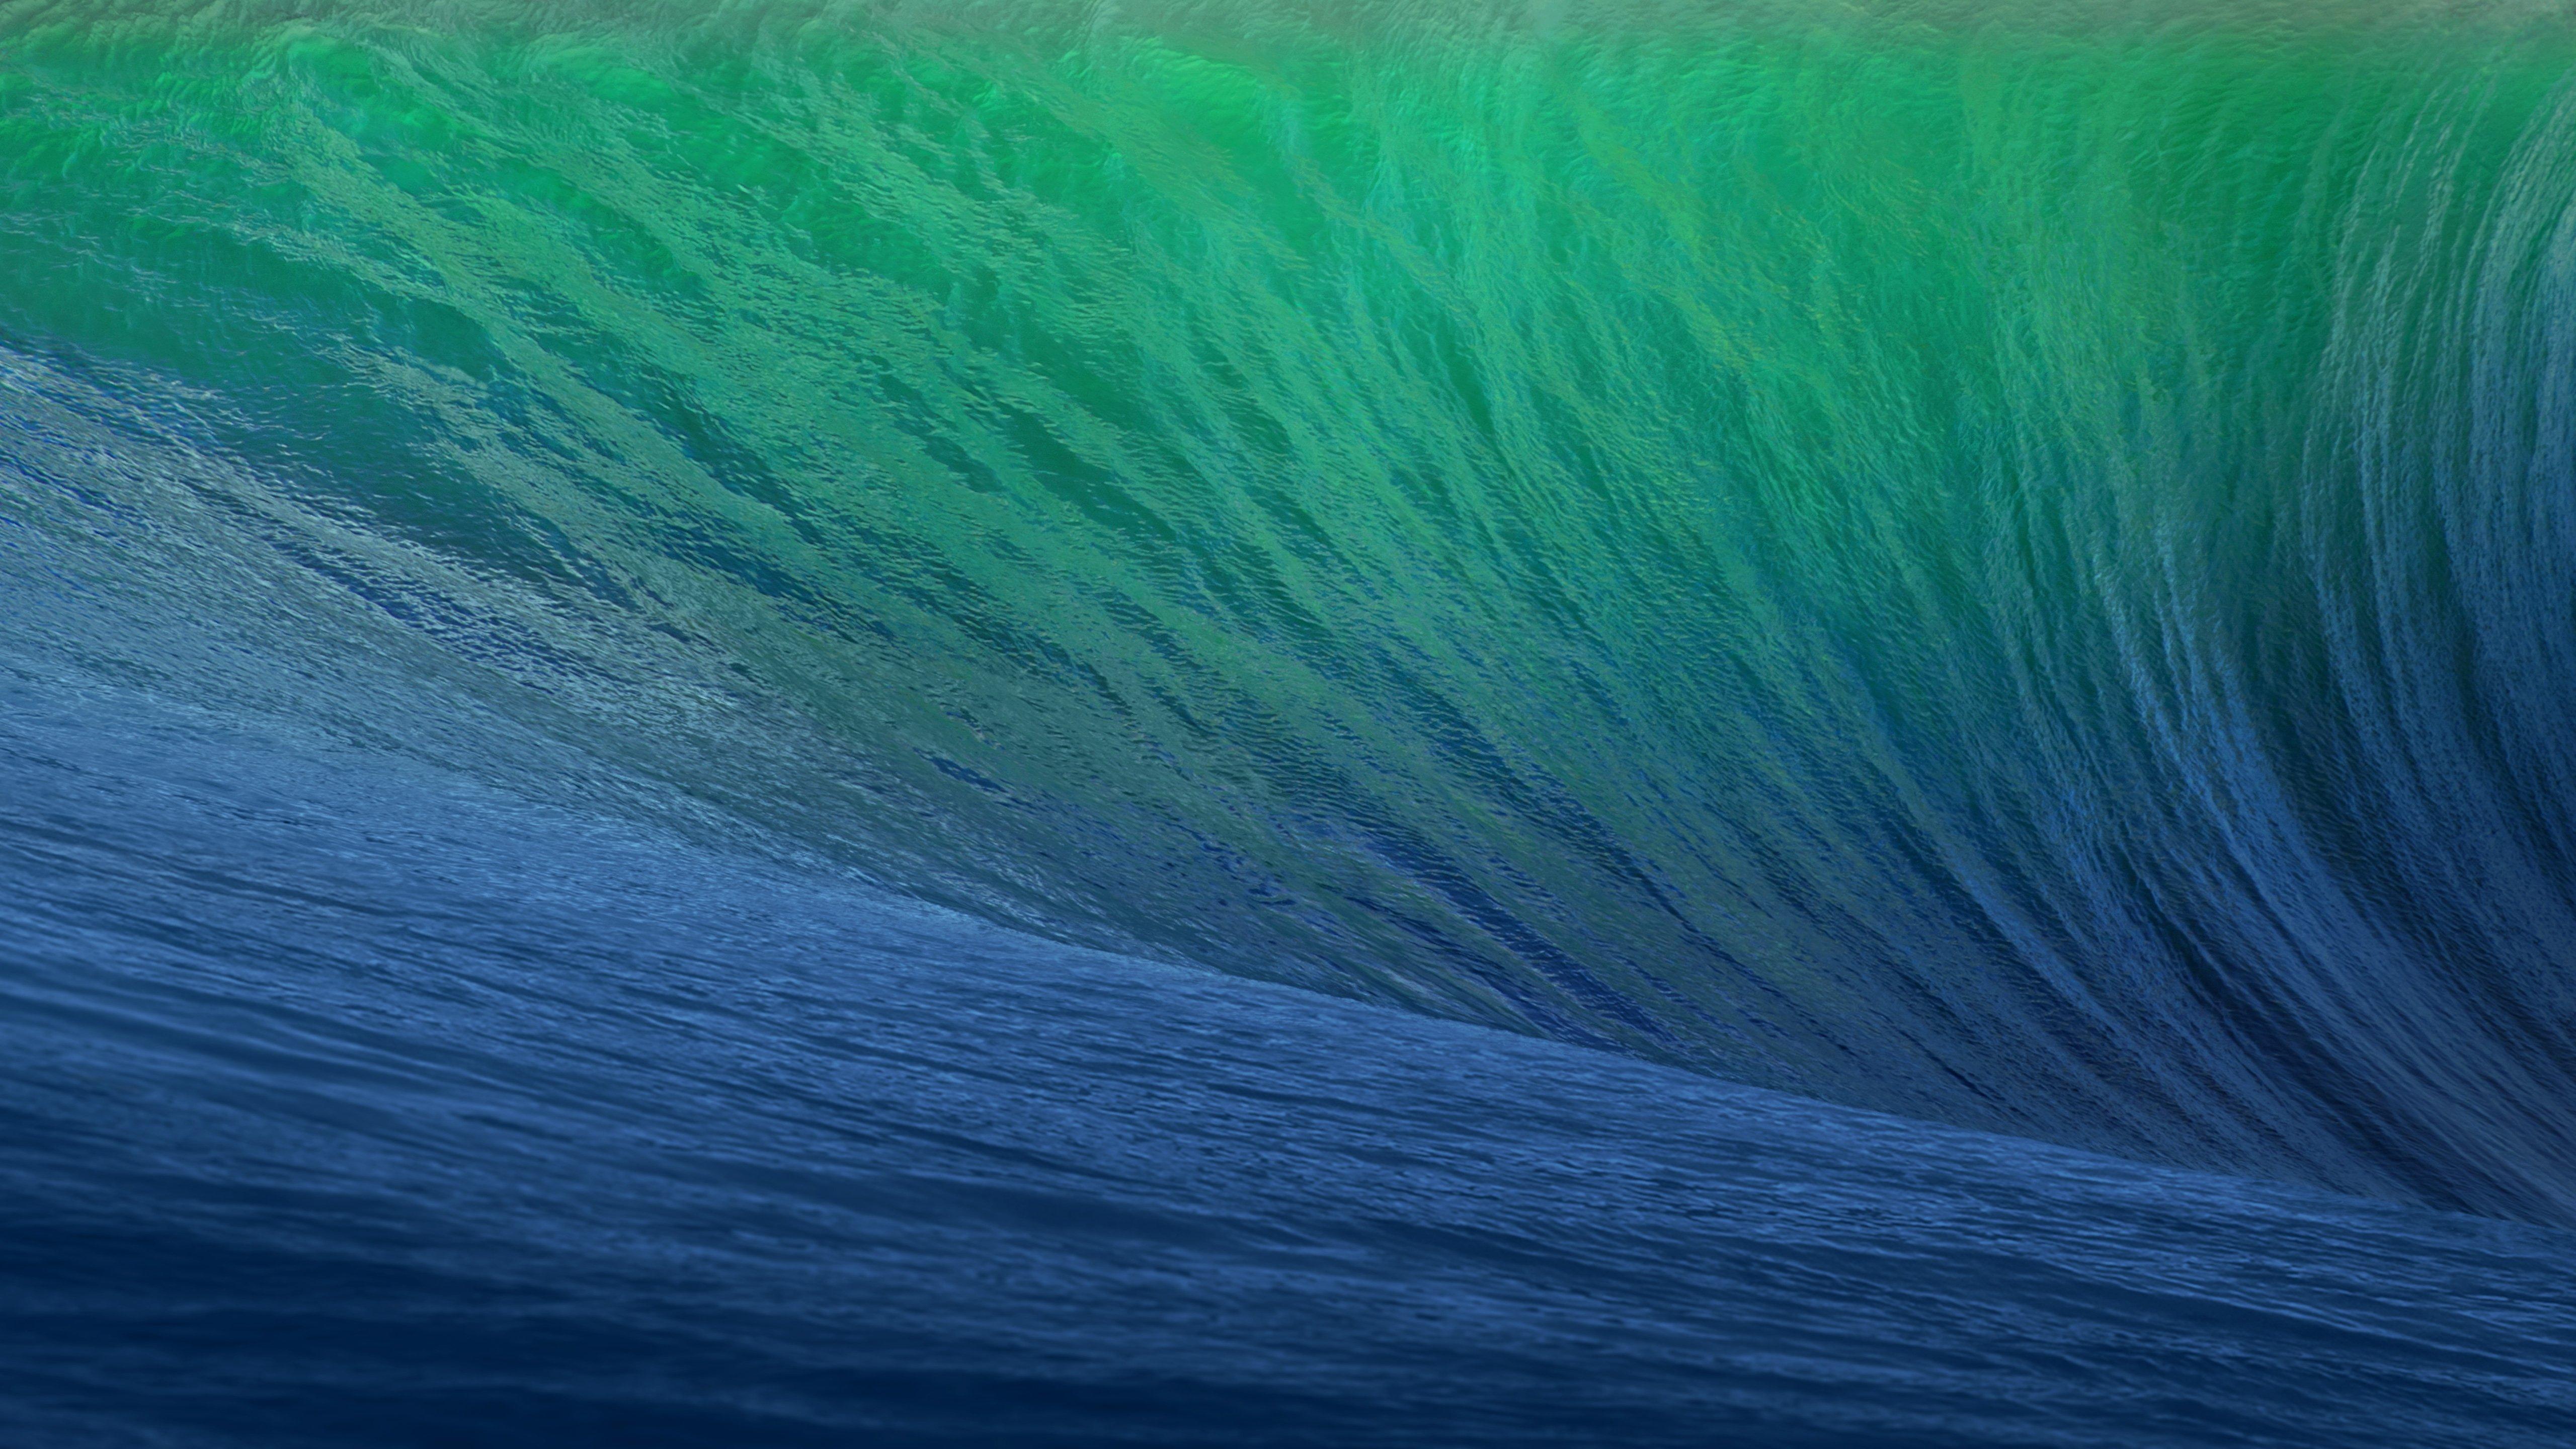 Displays Coming New Wallpaper for OS X 109 Mavericks Shows Up 5120x2880